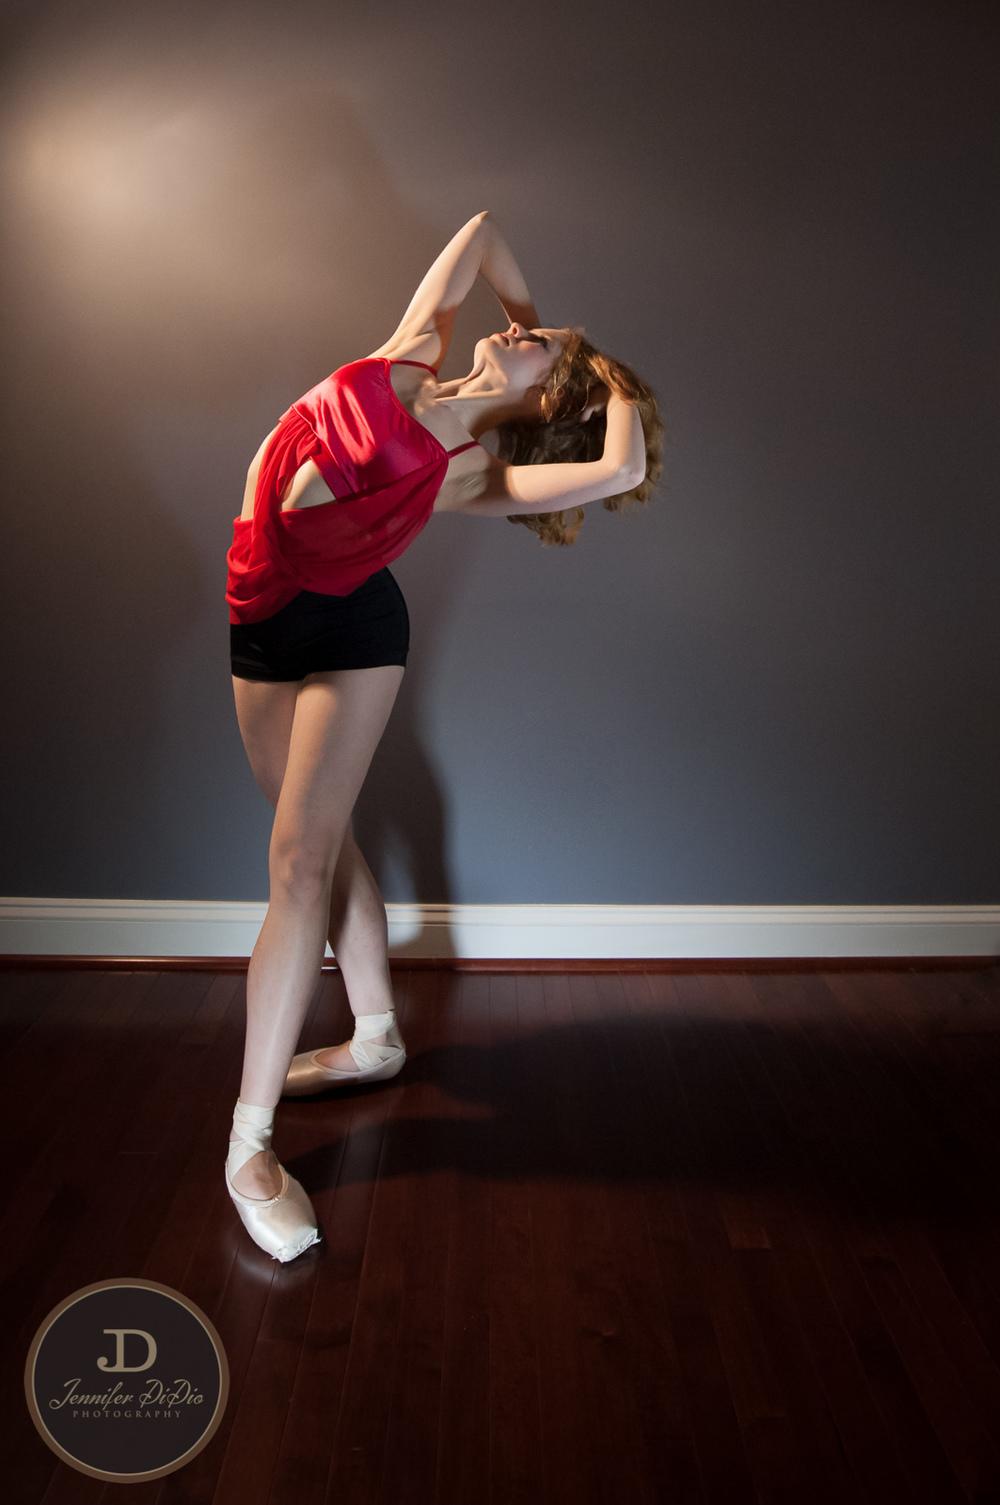 Jennifer.DiDio.Photography.miller.dance.2014-219.jpg